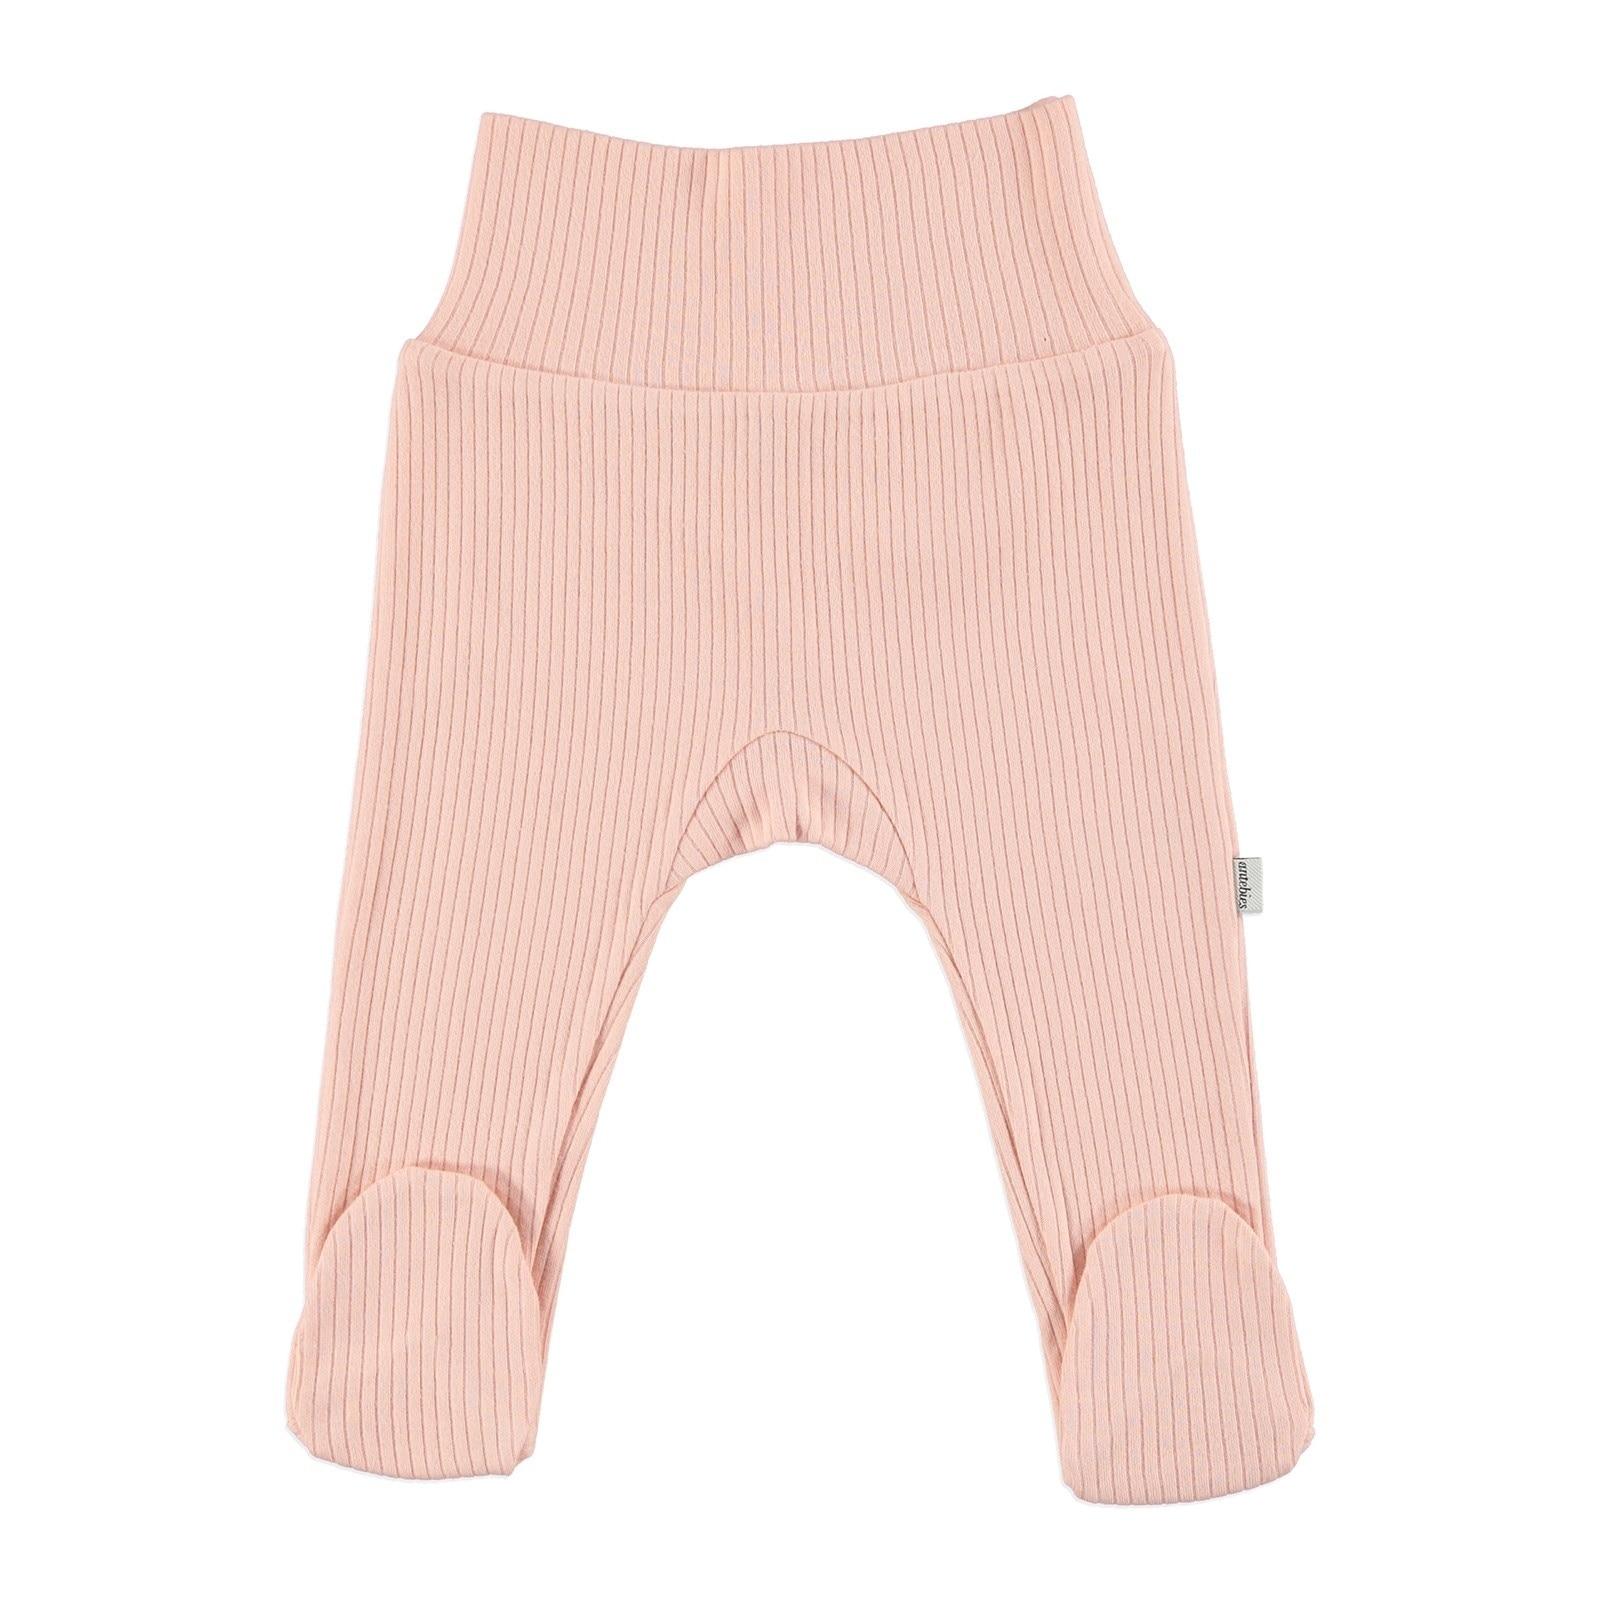 Ebebek Antebies Baby Organic Pink Reported Rib Pants